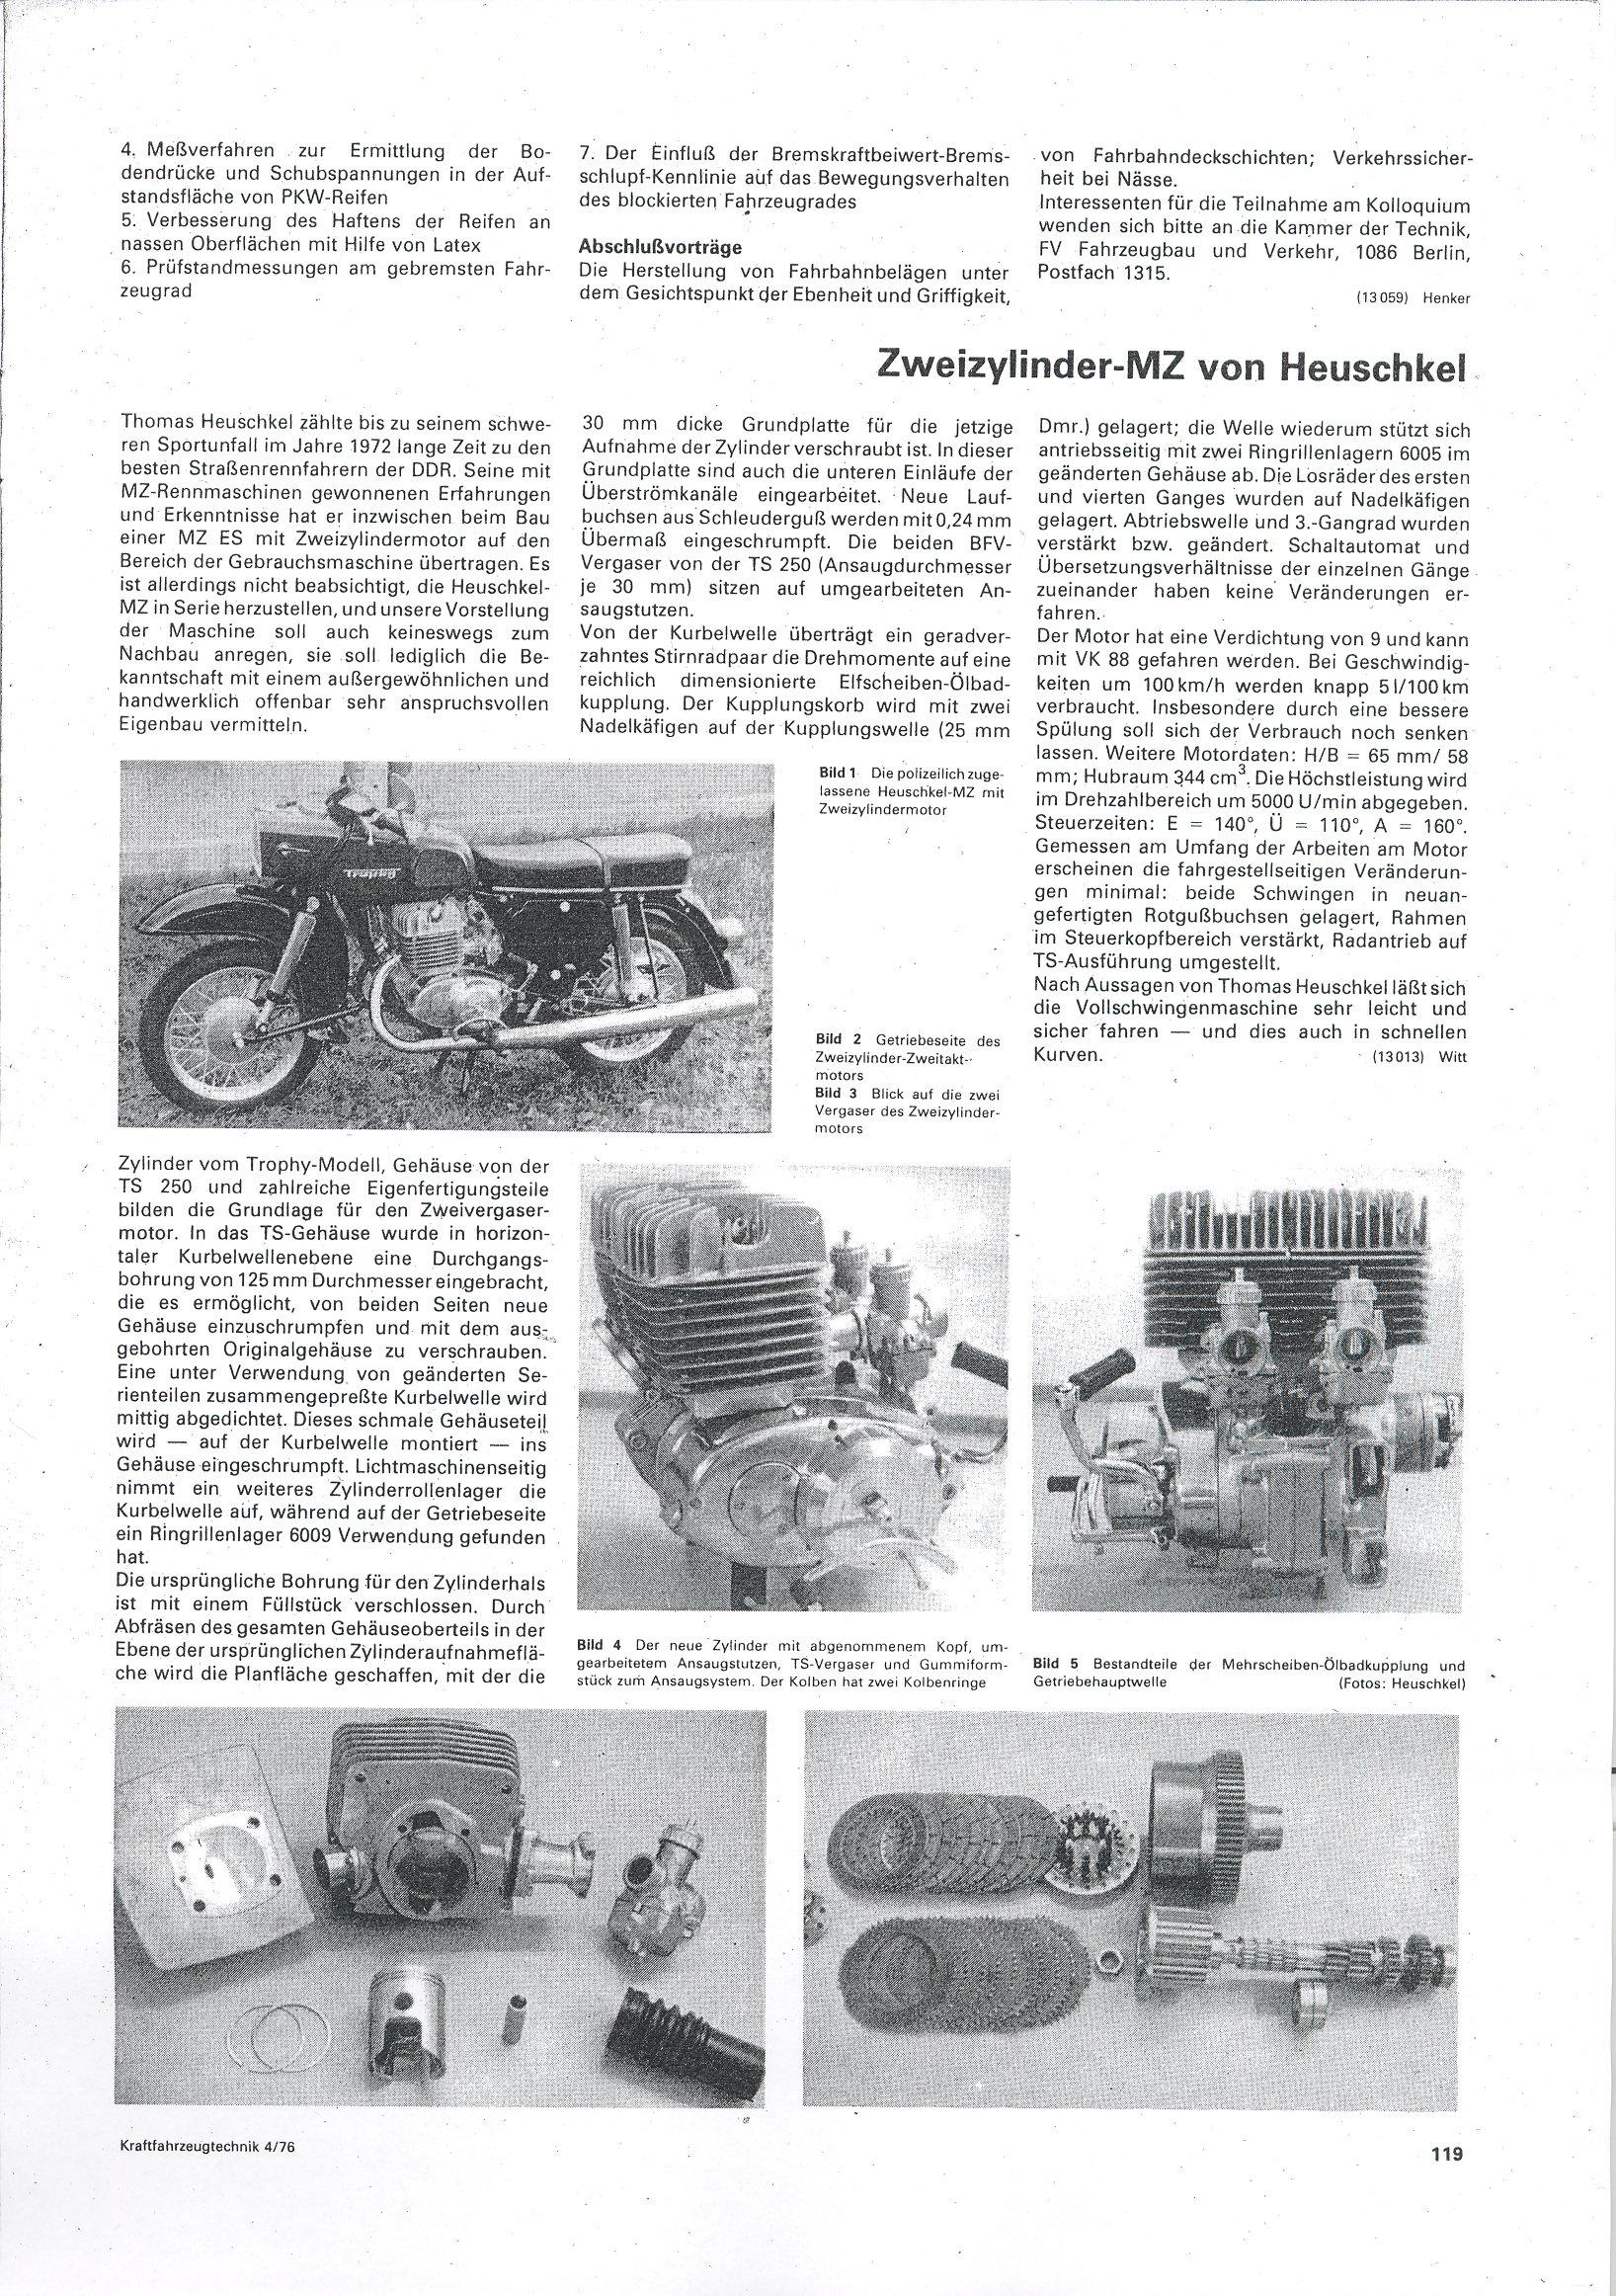 MZ ES 250 bicylindre de Thomas Heuschkel 197604_KFT_S119